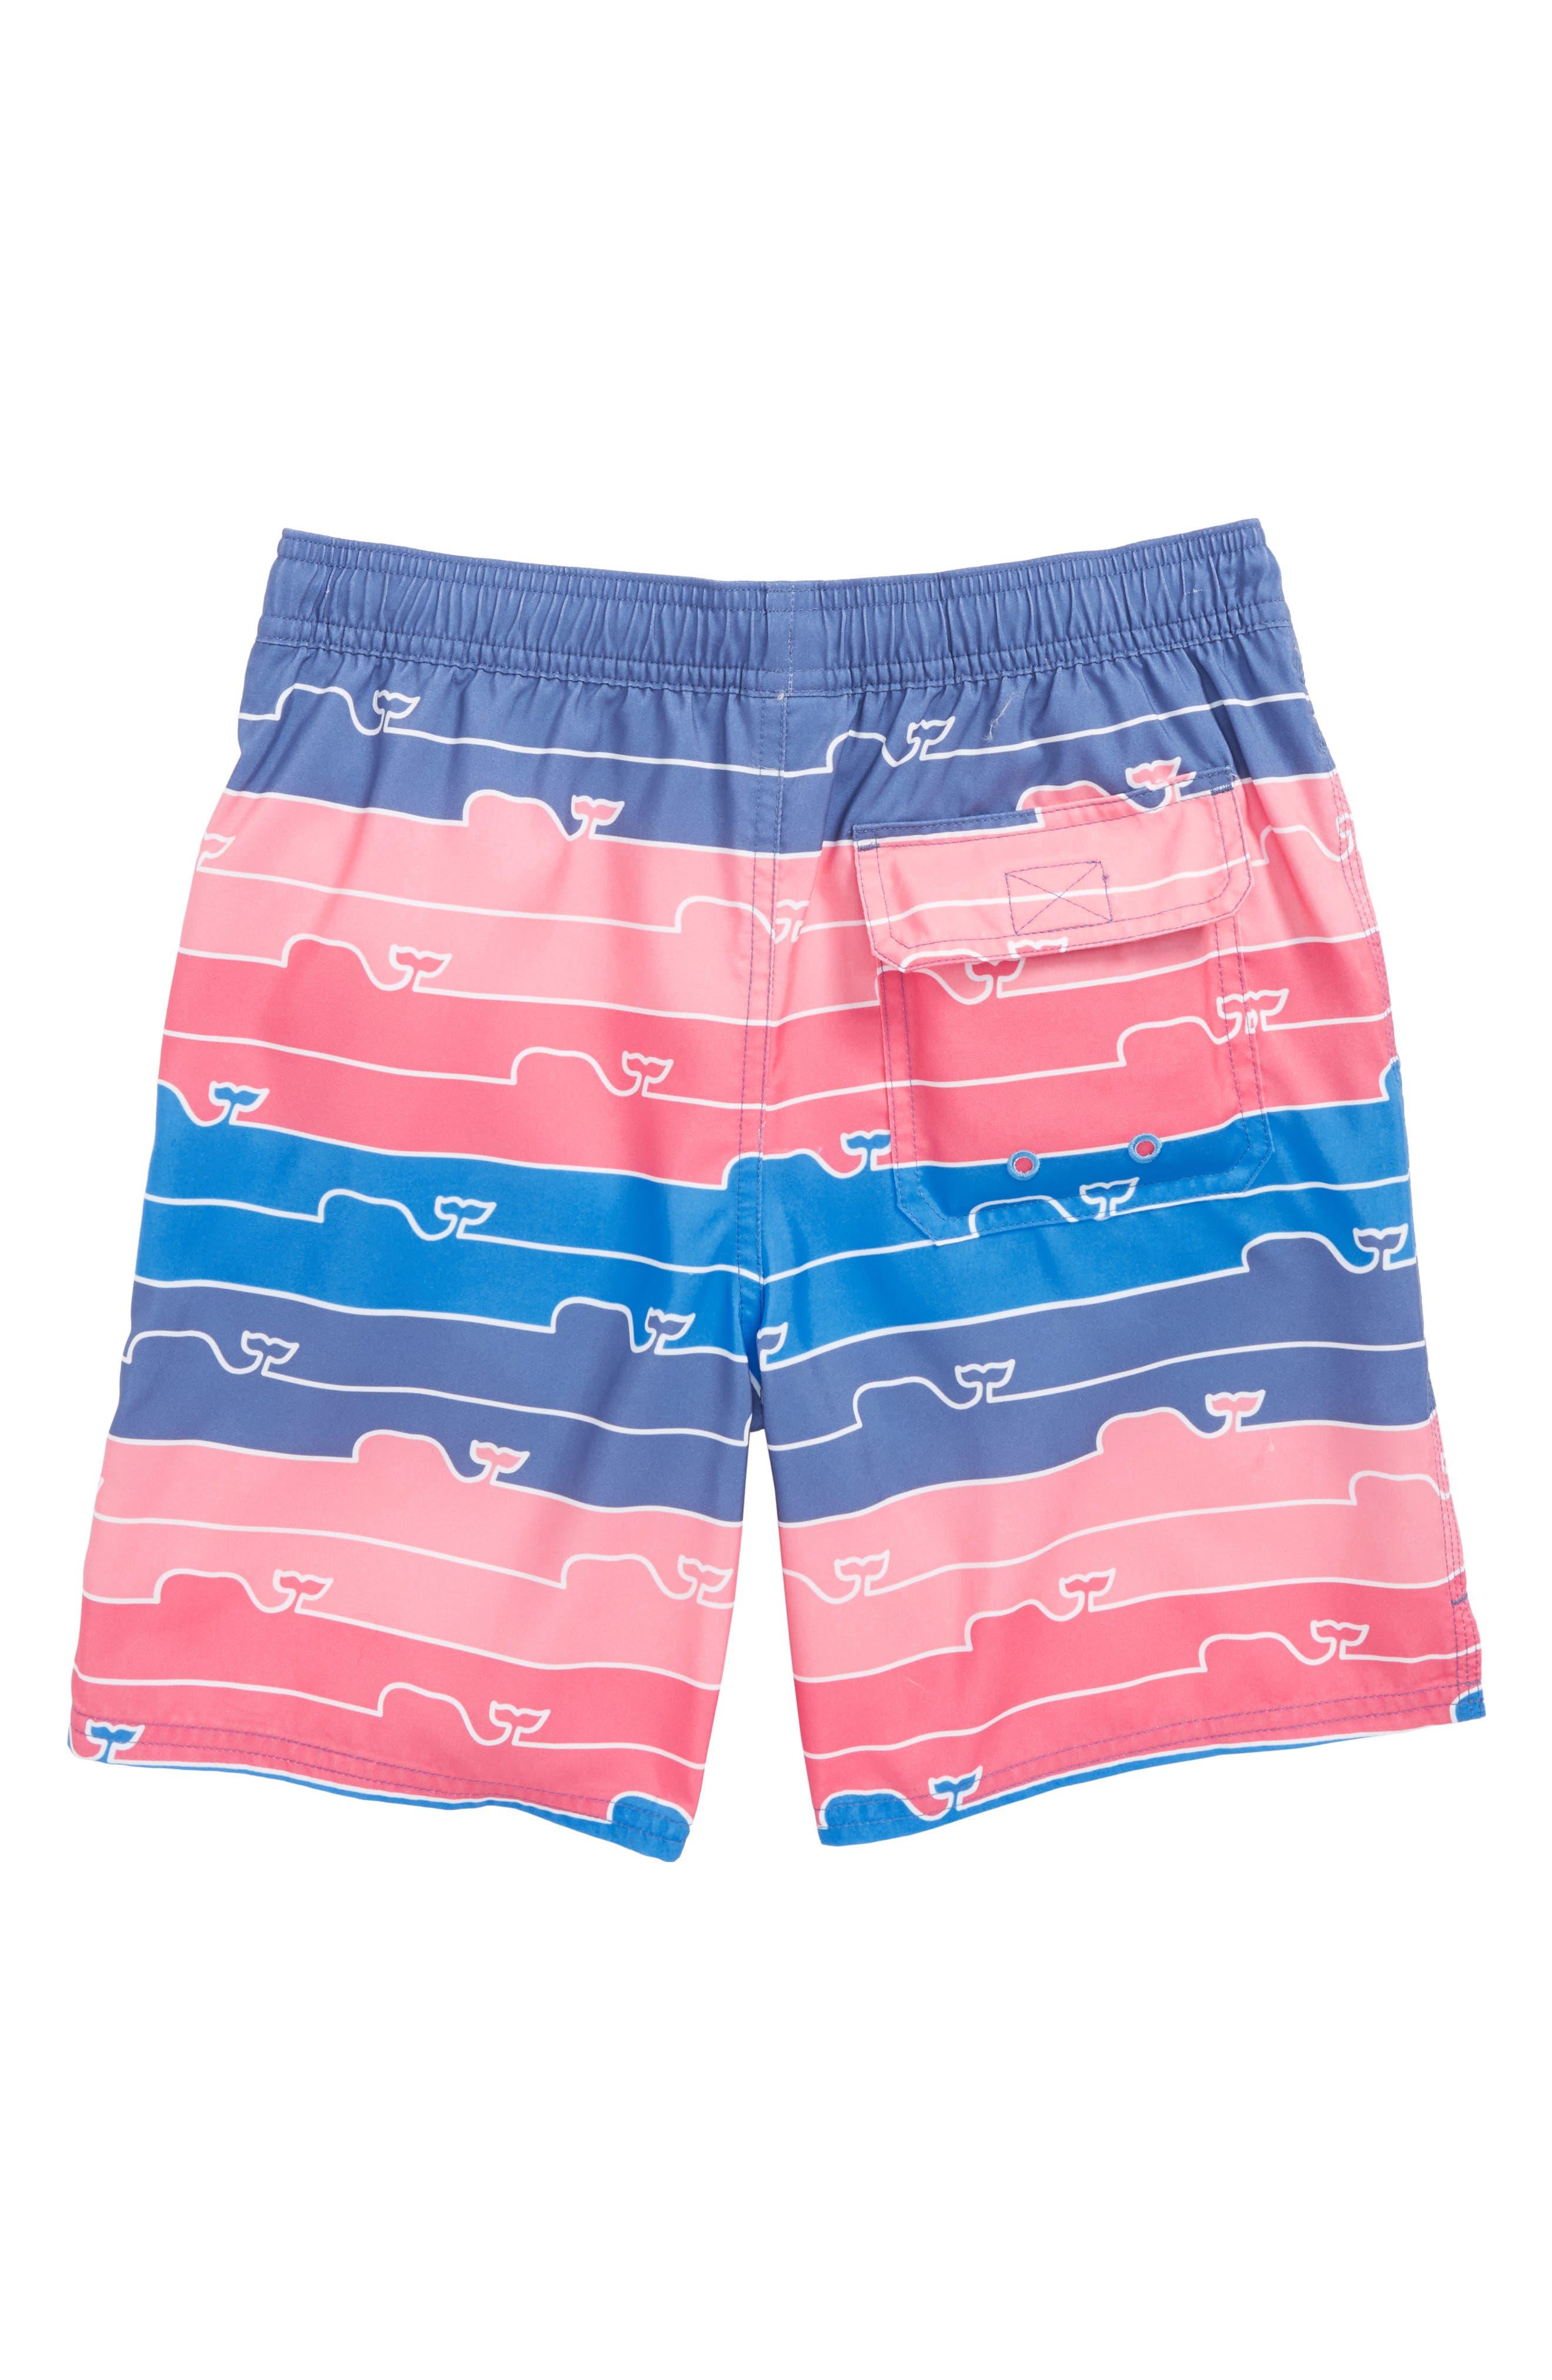 Chappy Whale Line Swim Trunks,                             Alternate thumbnail 3, color,                             Moonshine